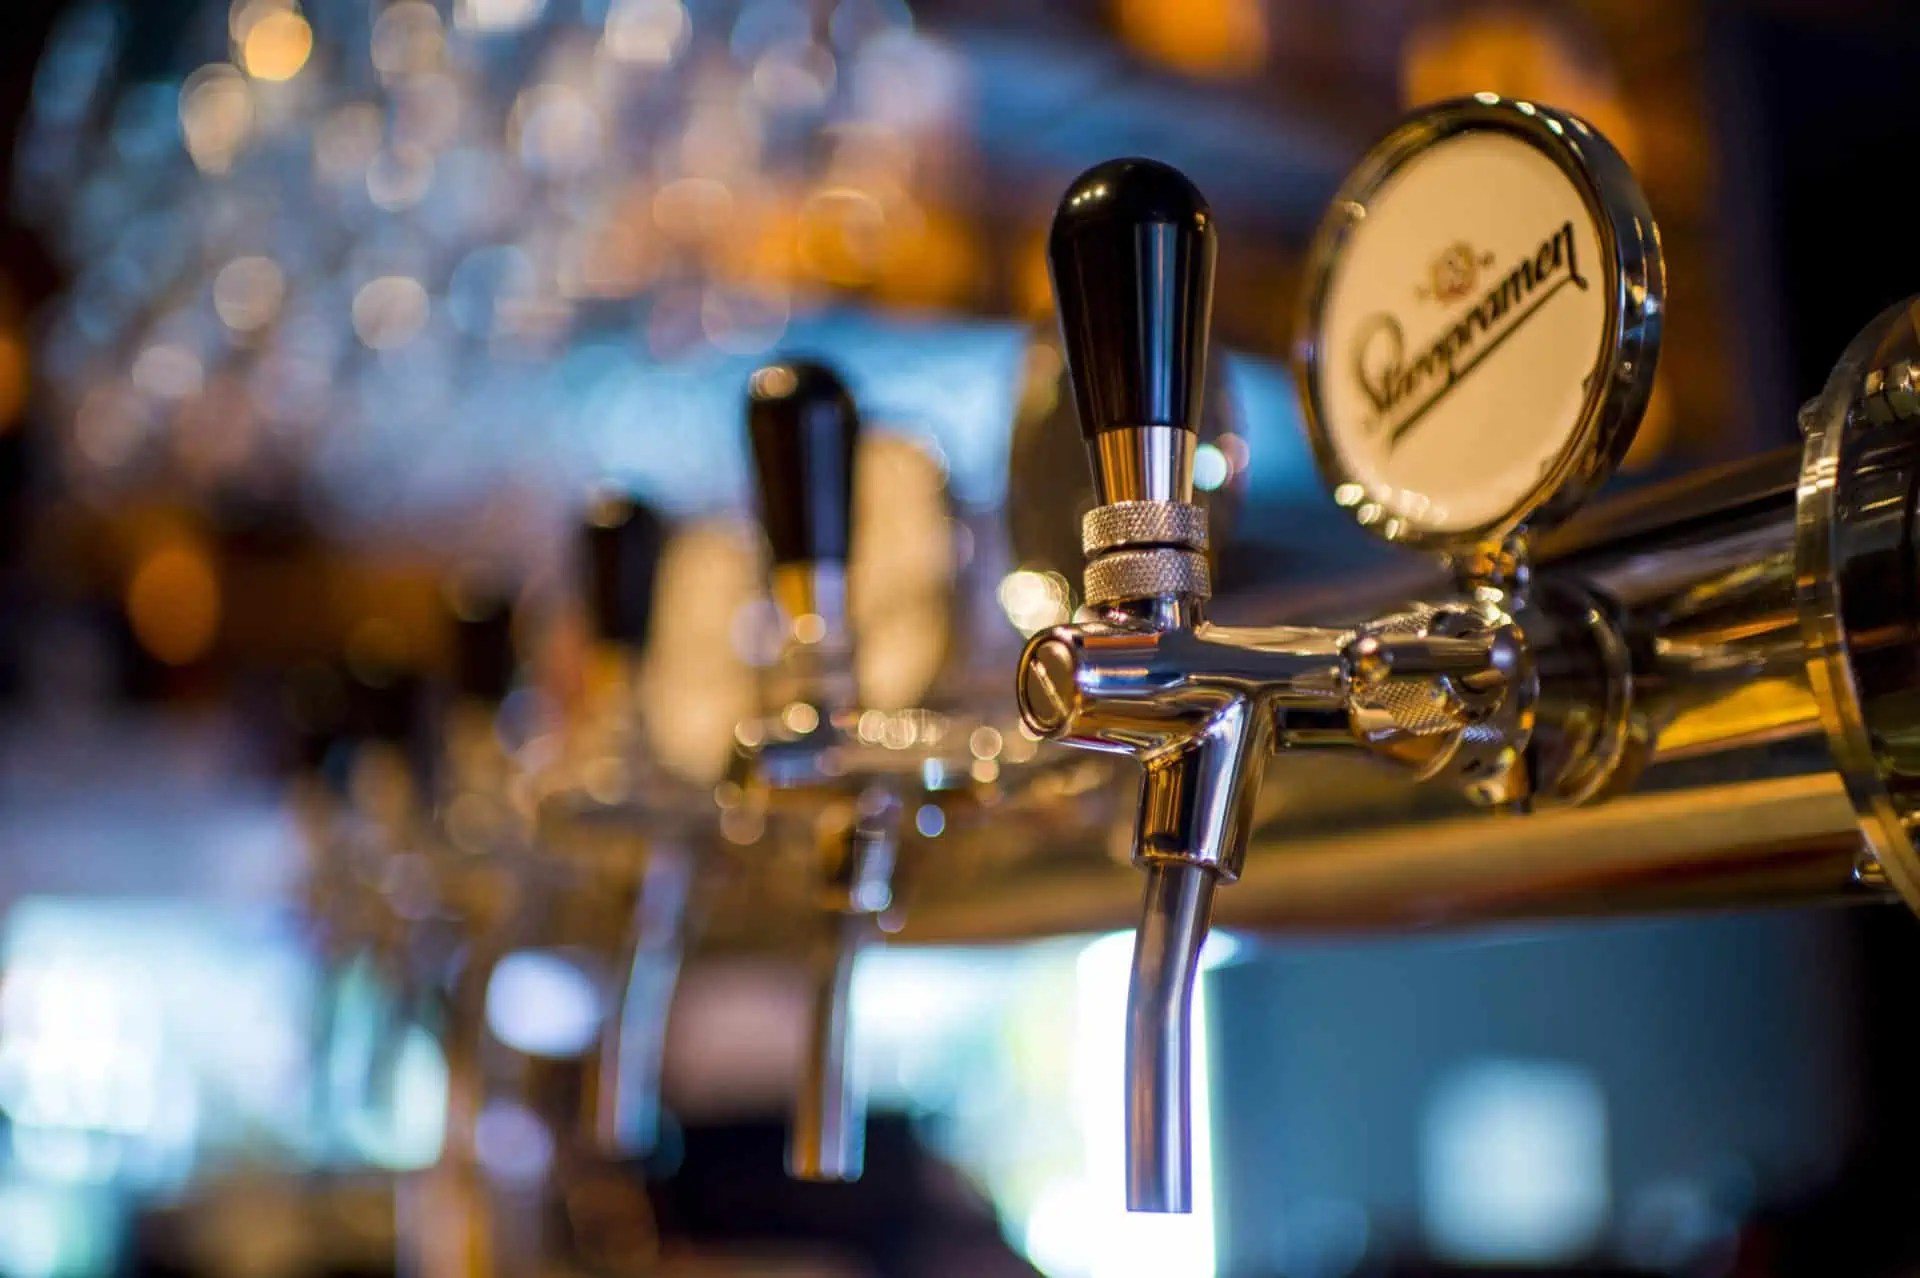 alcohol-ale-bar-159291